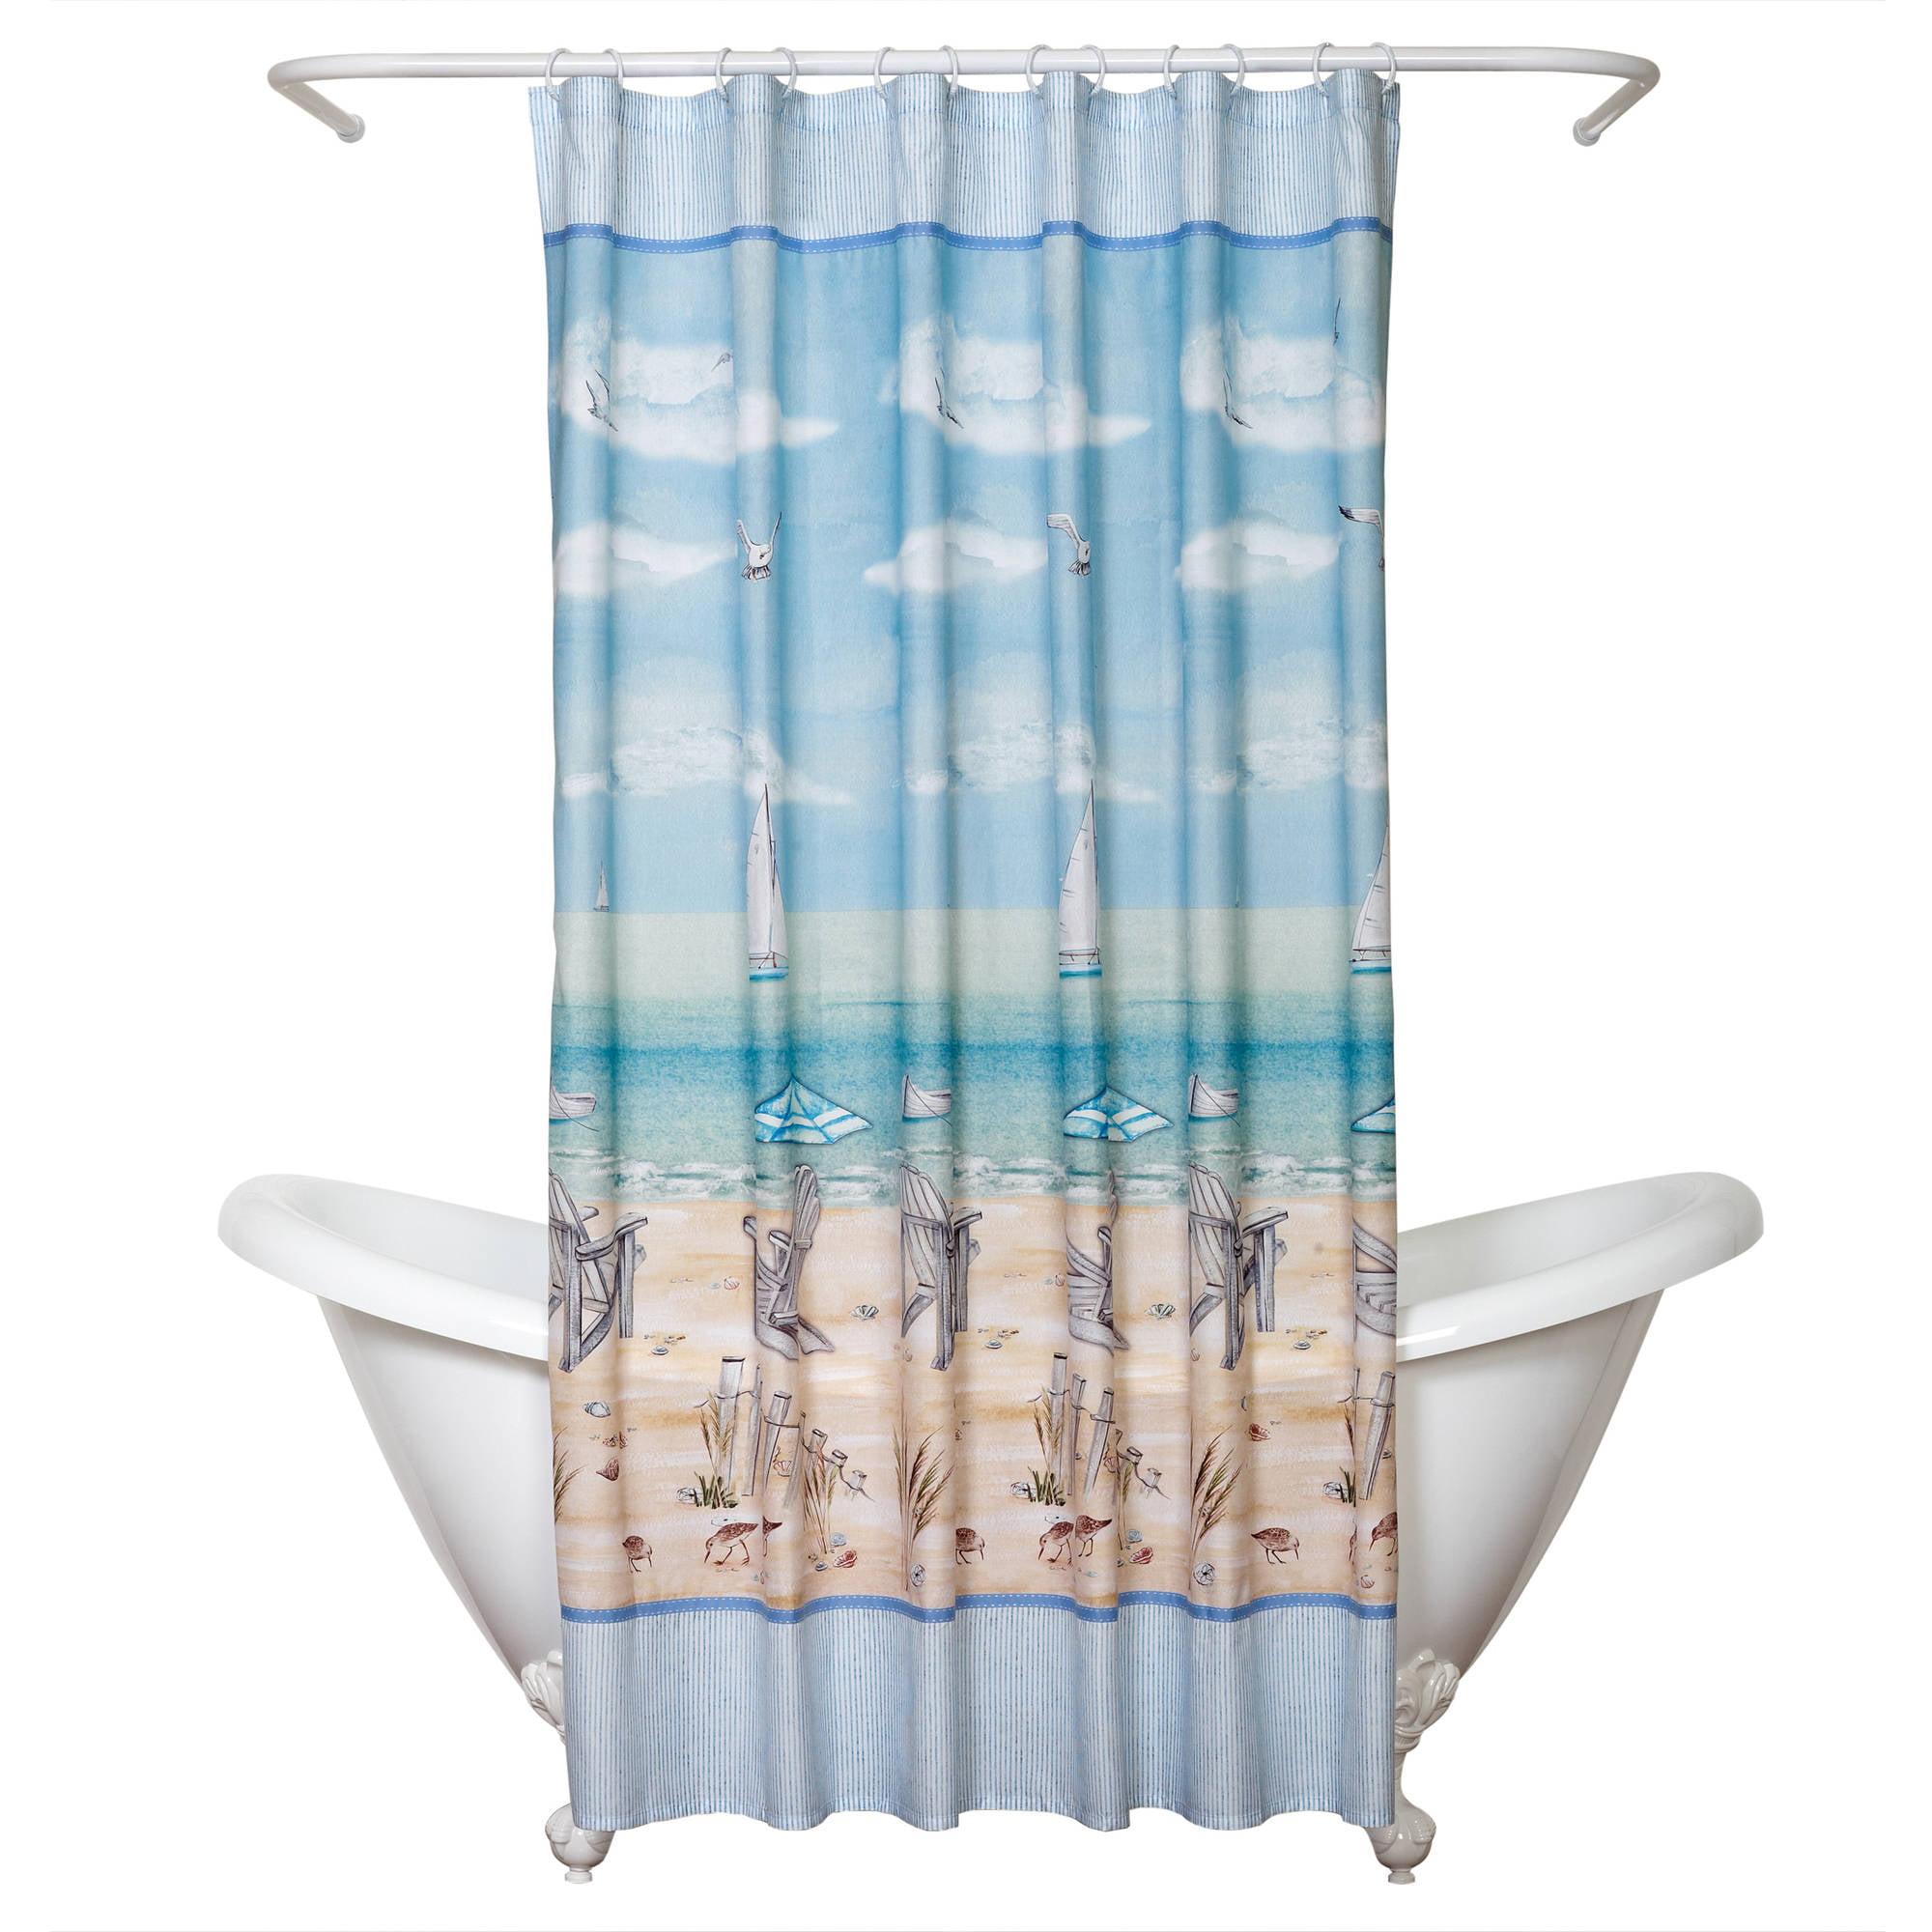 Zenna Home India Ink Seaside Serenity Shower Curtain, Coastal/Beach